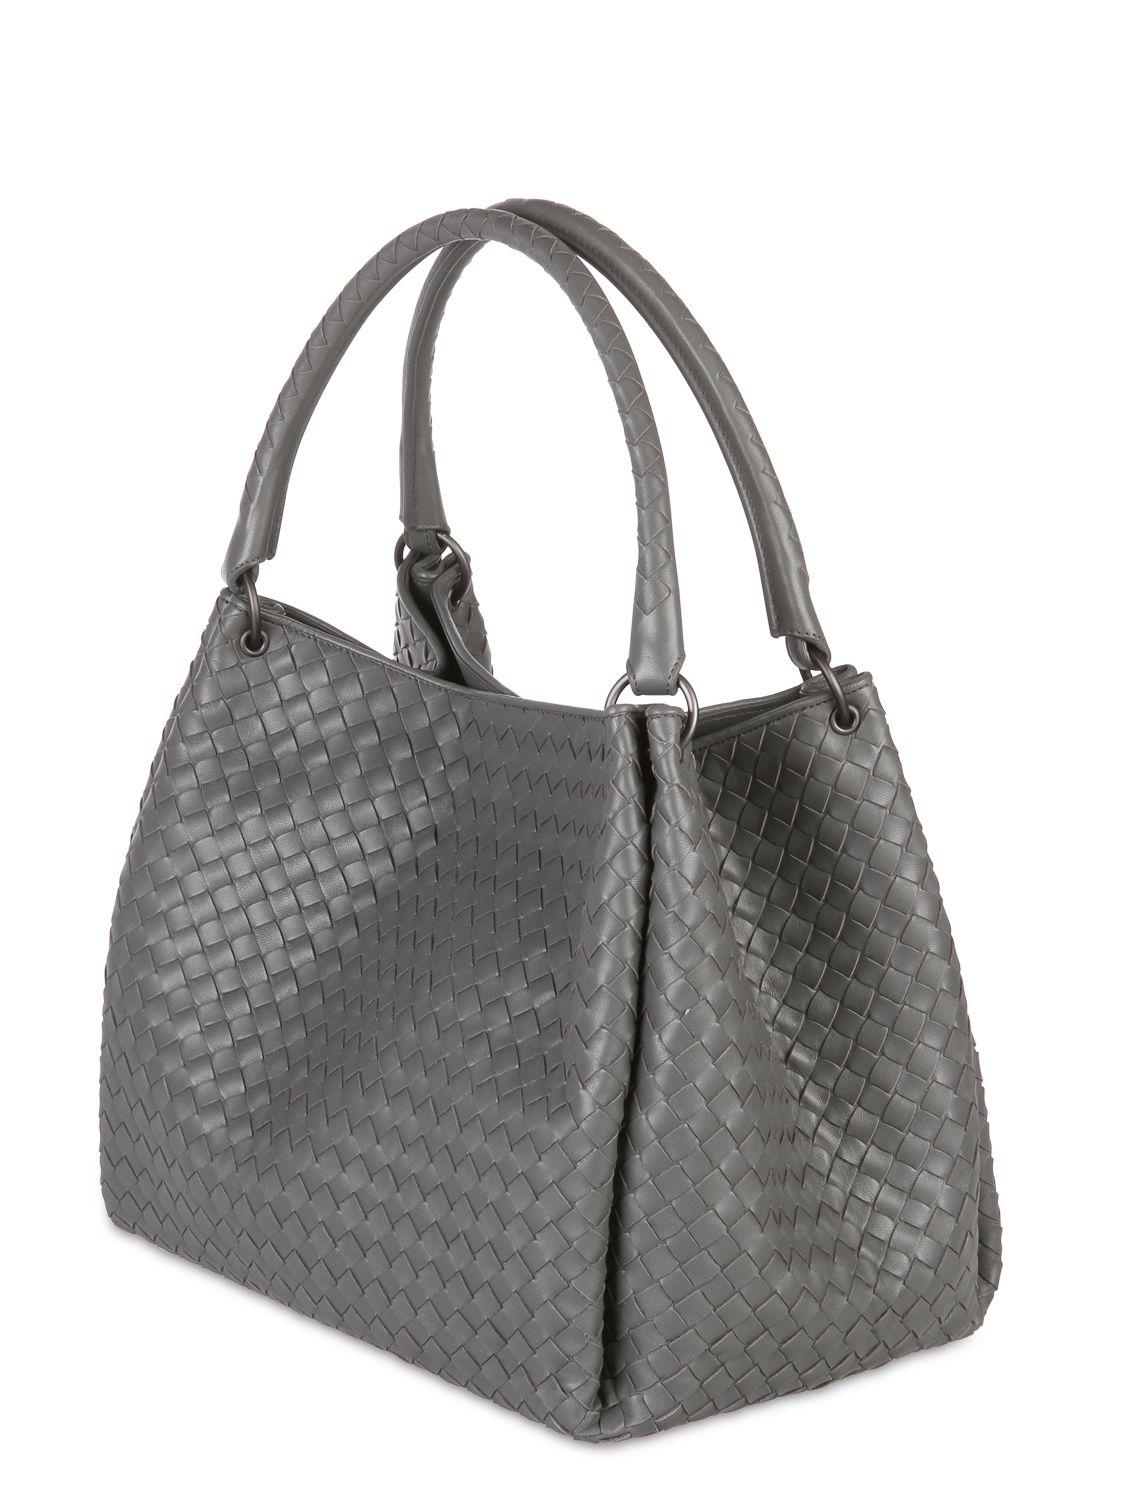 Lyst Bottega Veneta Parachute Intrecciato Nappa Leather